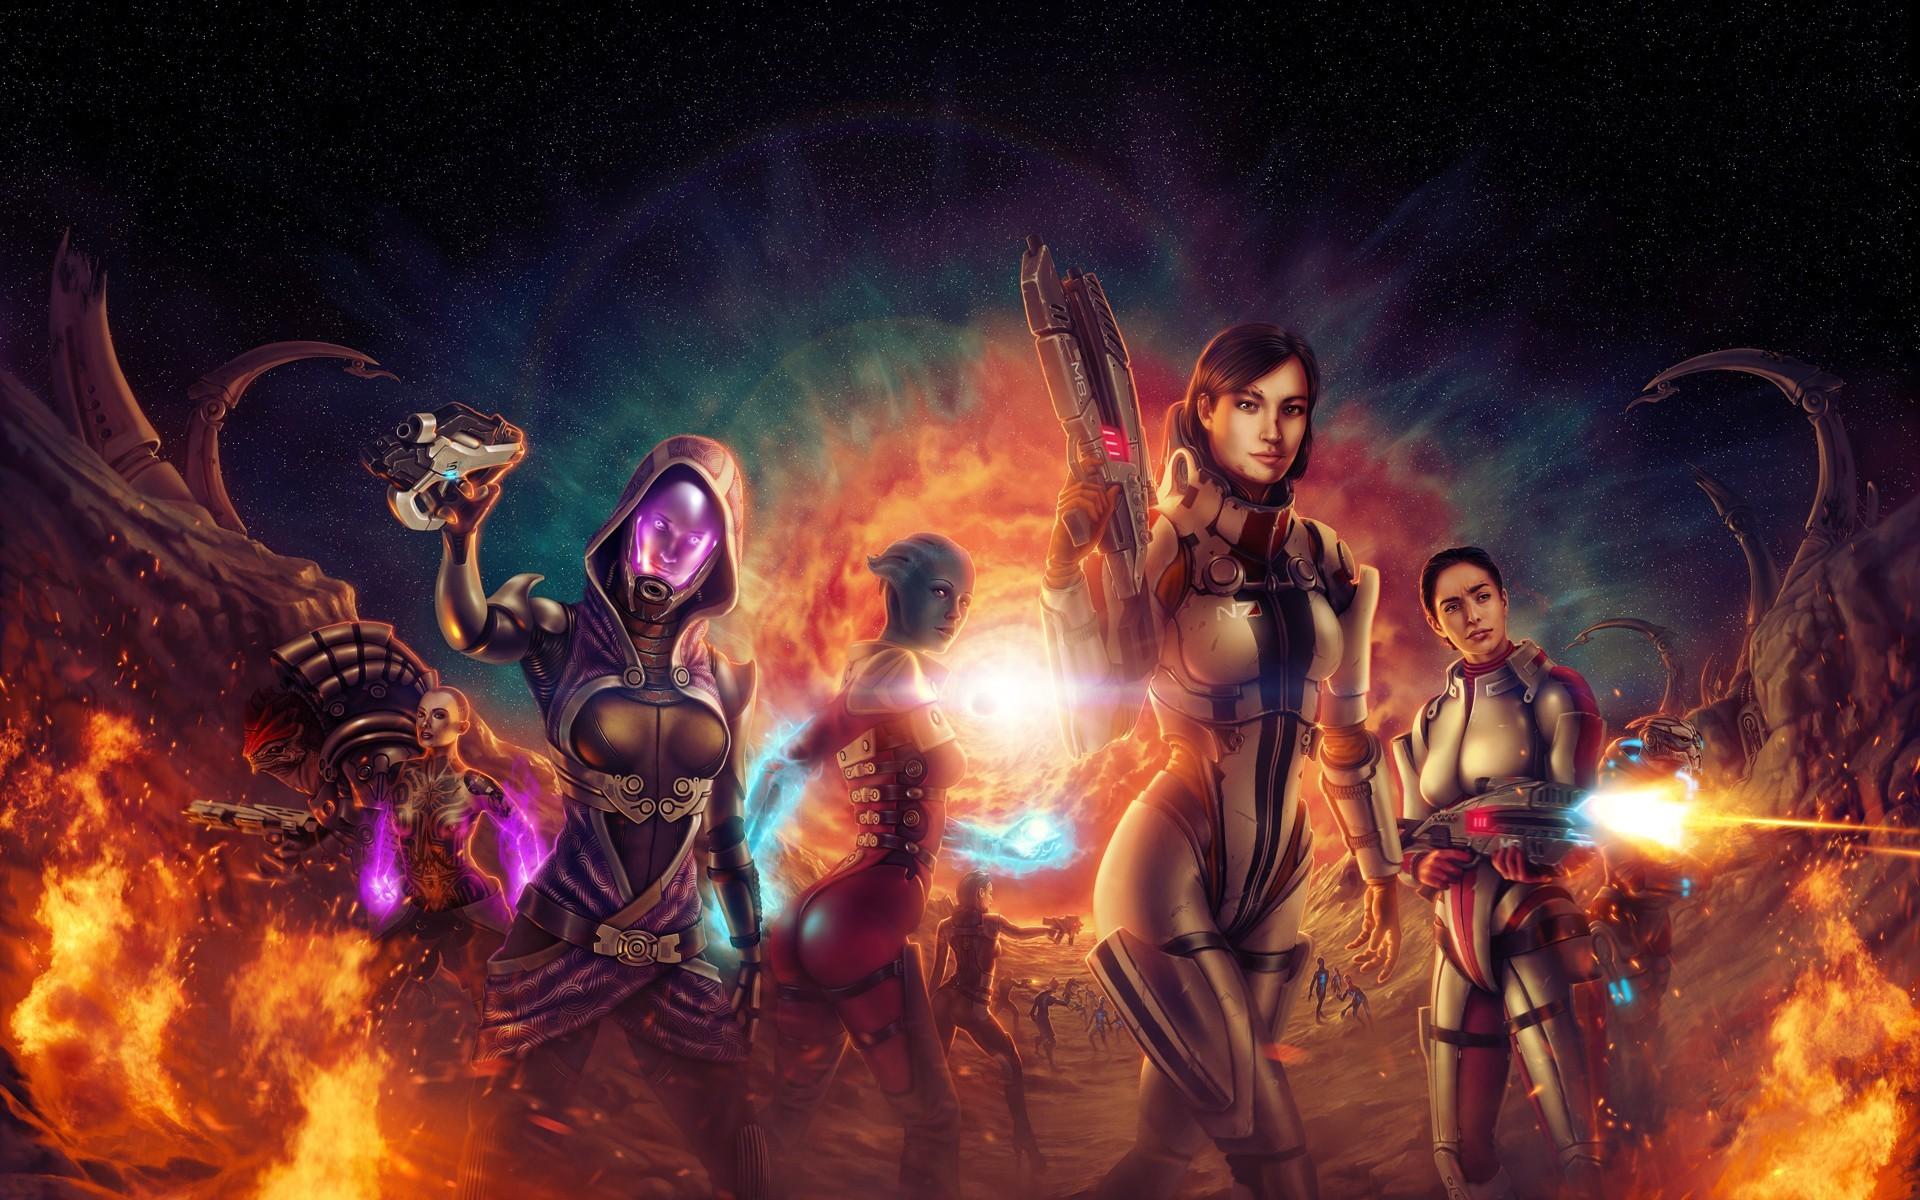 Ashley Williams Commander Shepard FemShep Garrus Vakarian Liara TSoni Mass  Effect Tali Zorah Nar Rayya Wrex